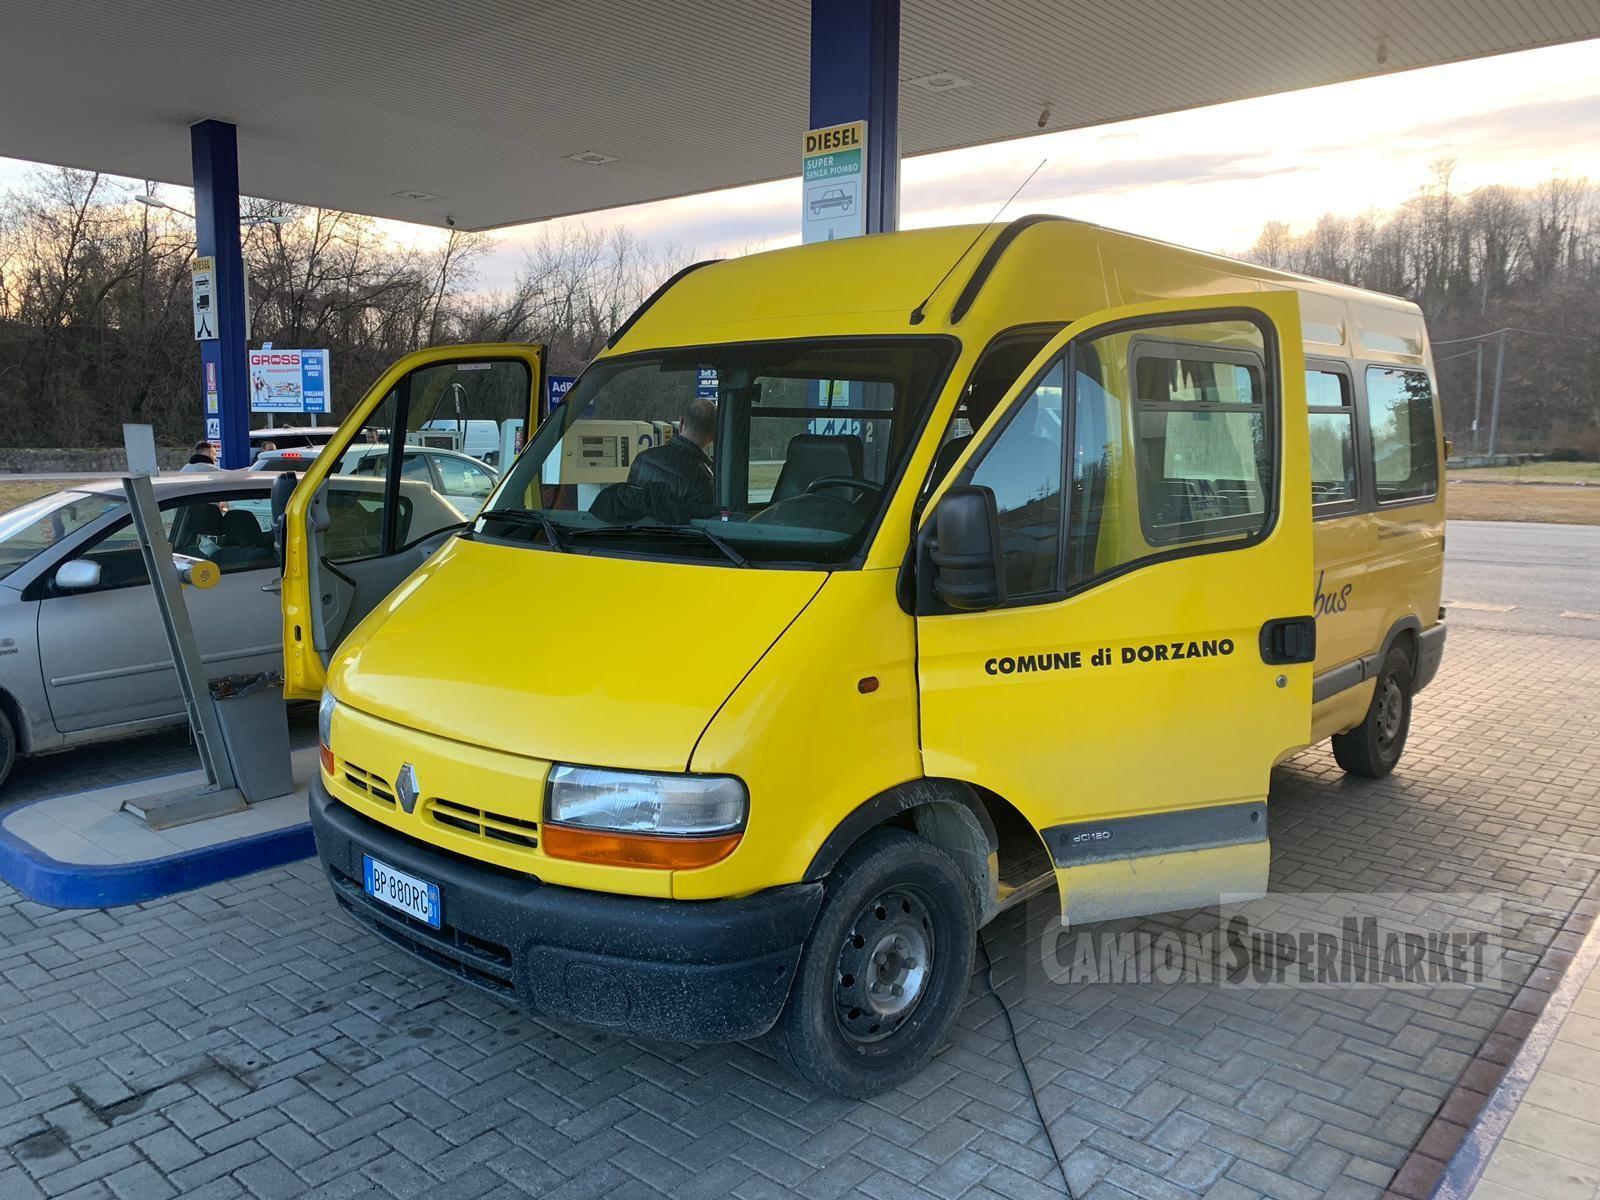 Renault MASTER Usato 2002